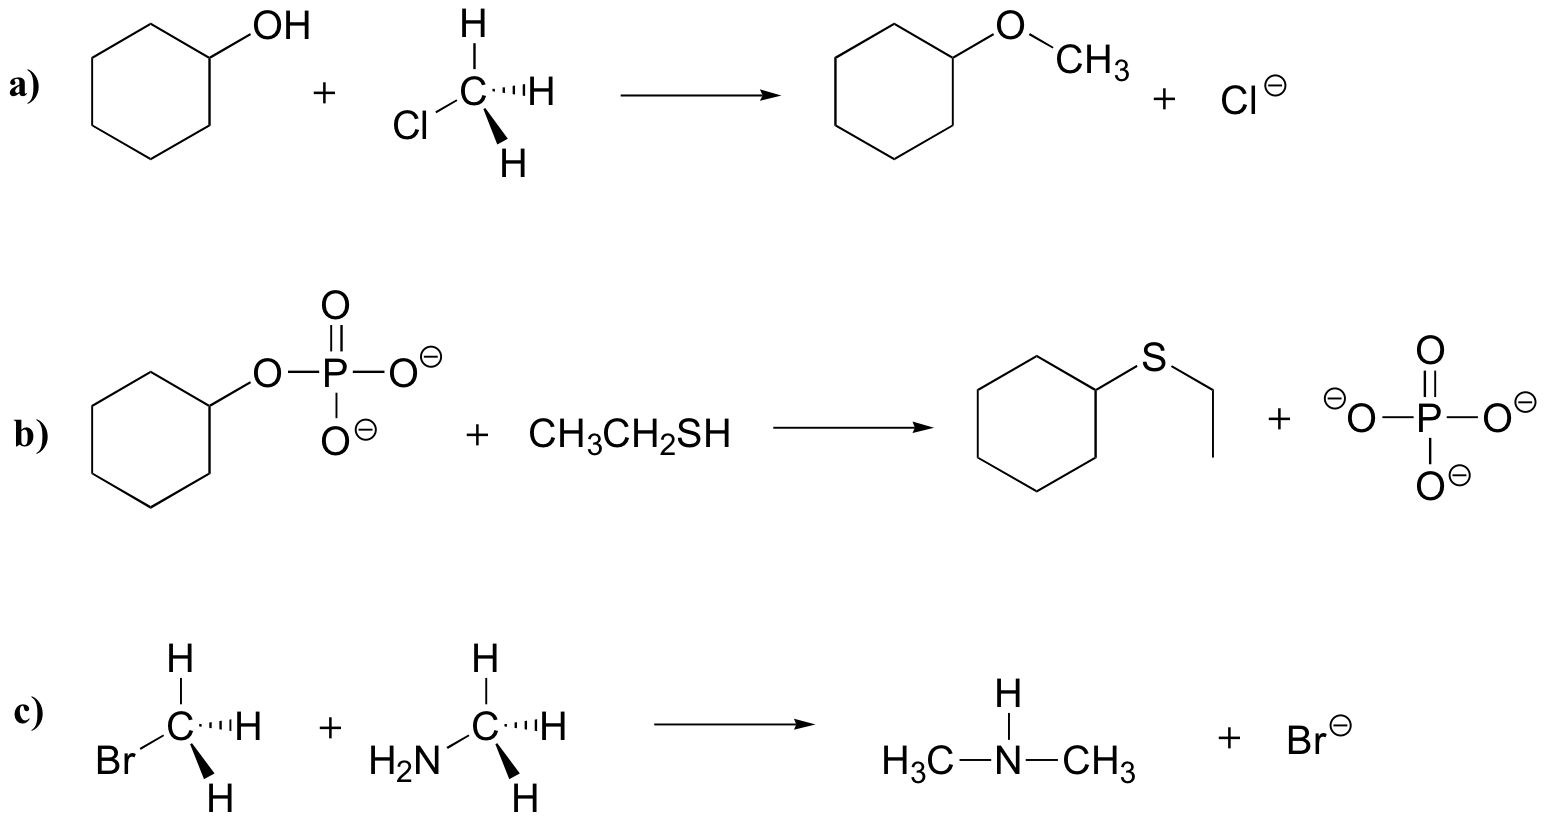 image016.png